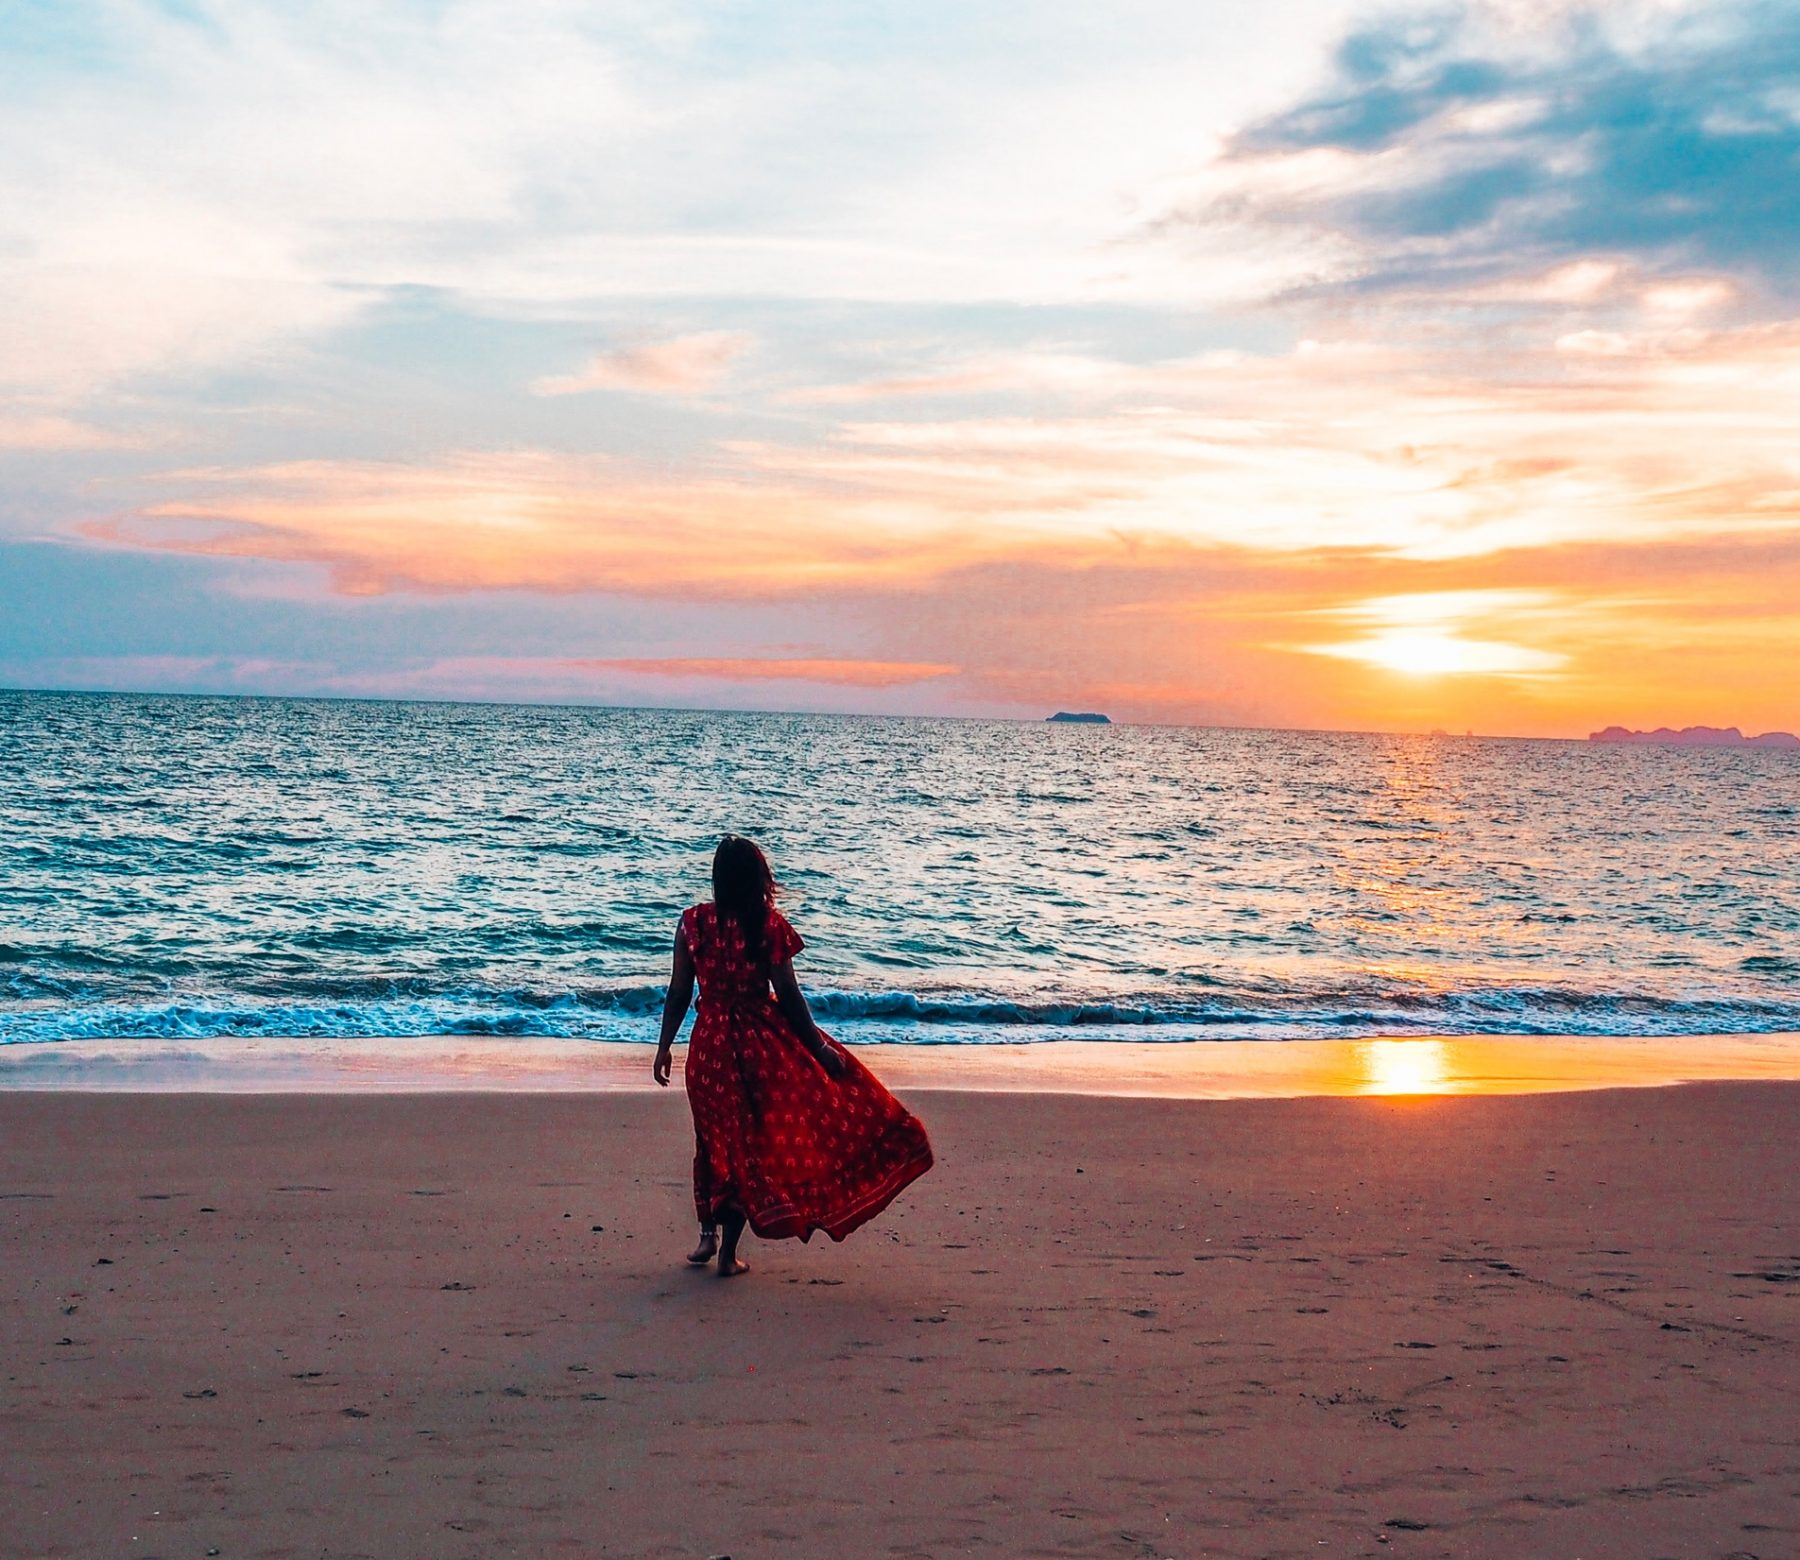 Koh Lanta beach view, sunset, Thailand 2019